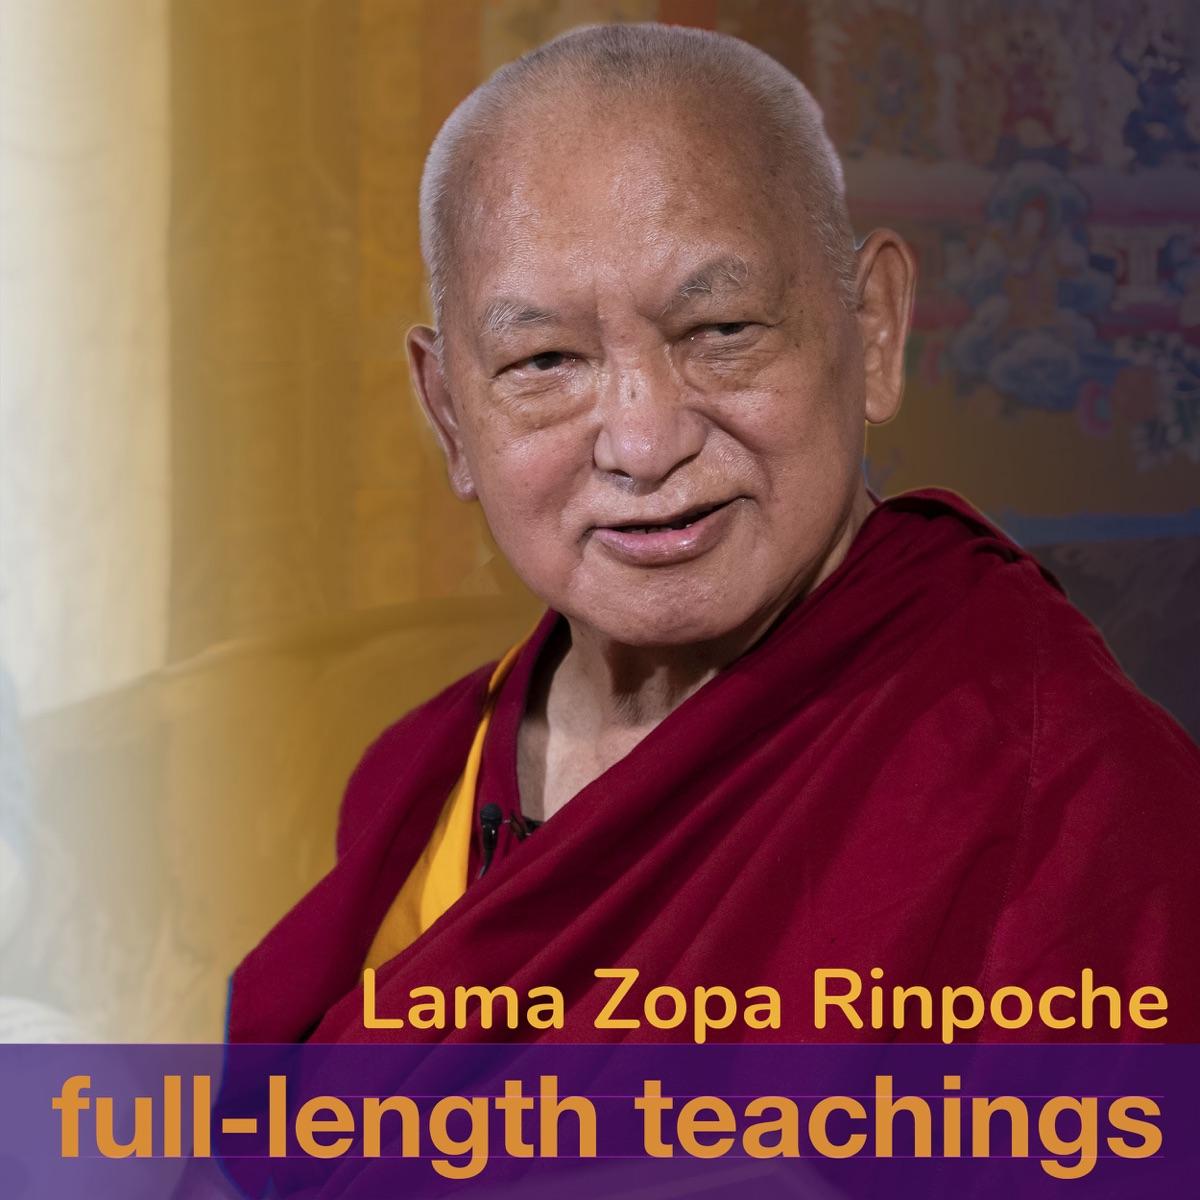 Lama Zopa Rinpoche full length teachings